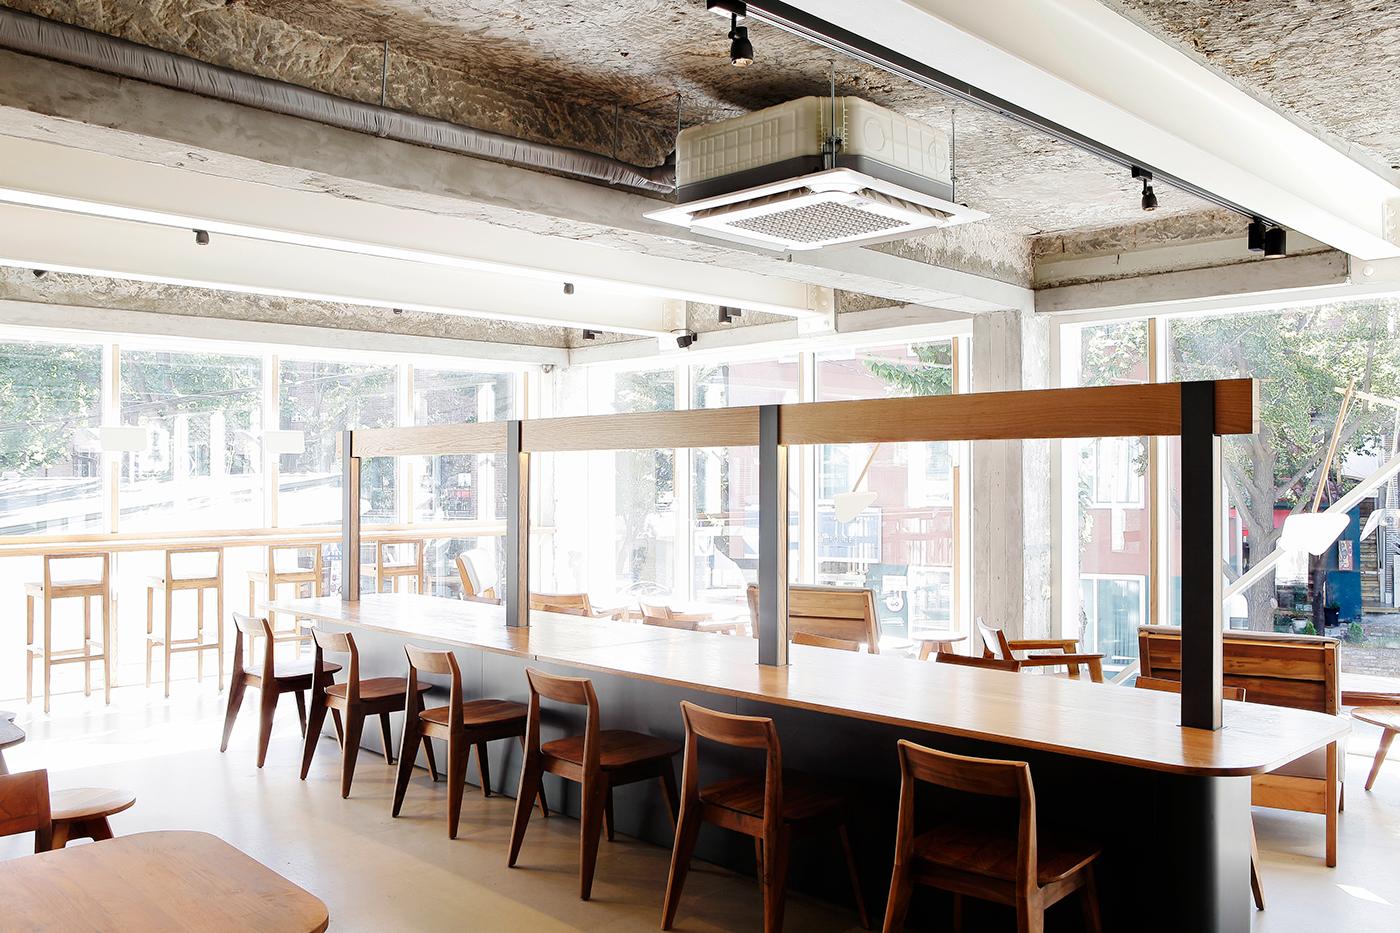 Cafe Kona Queens on